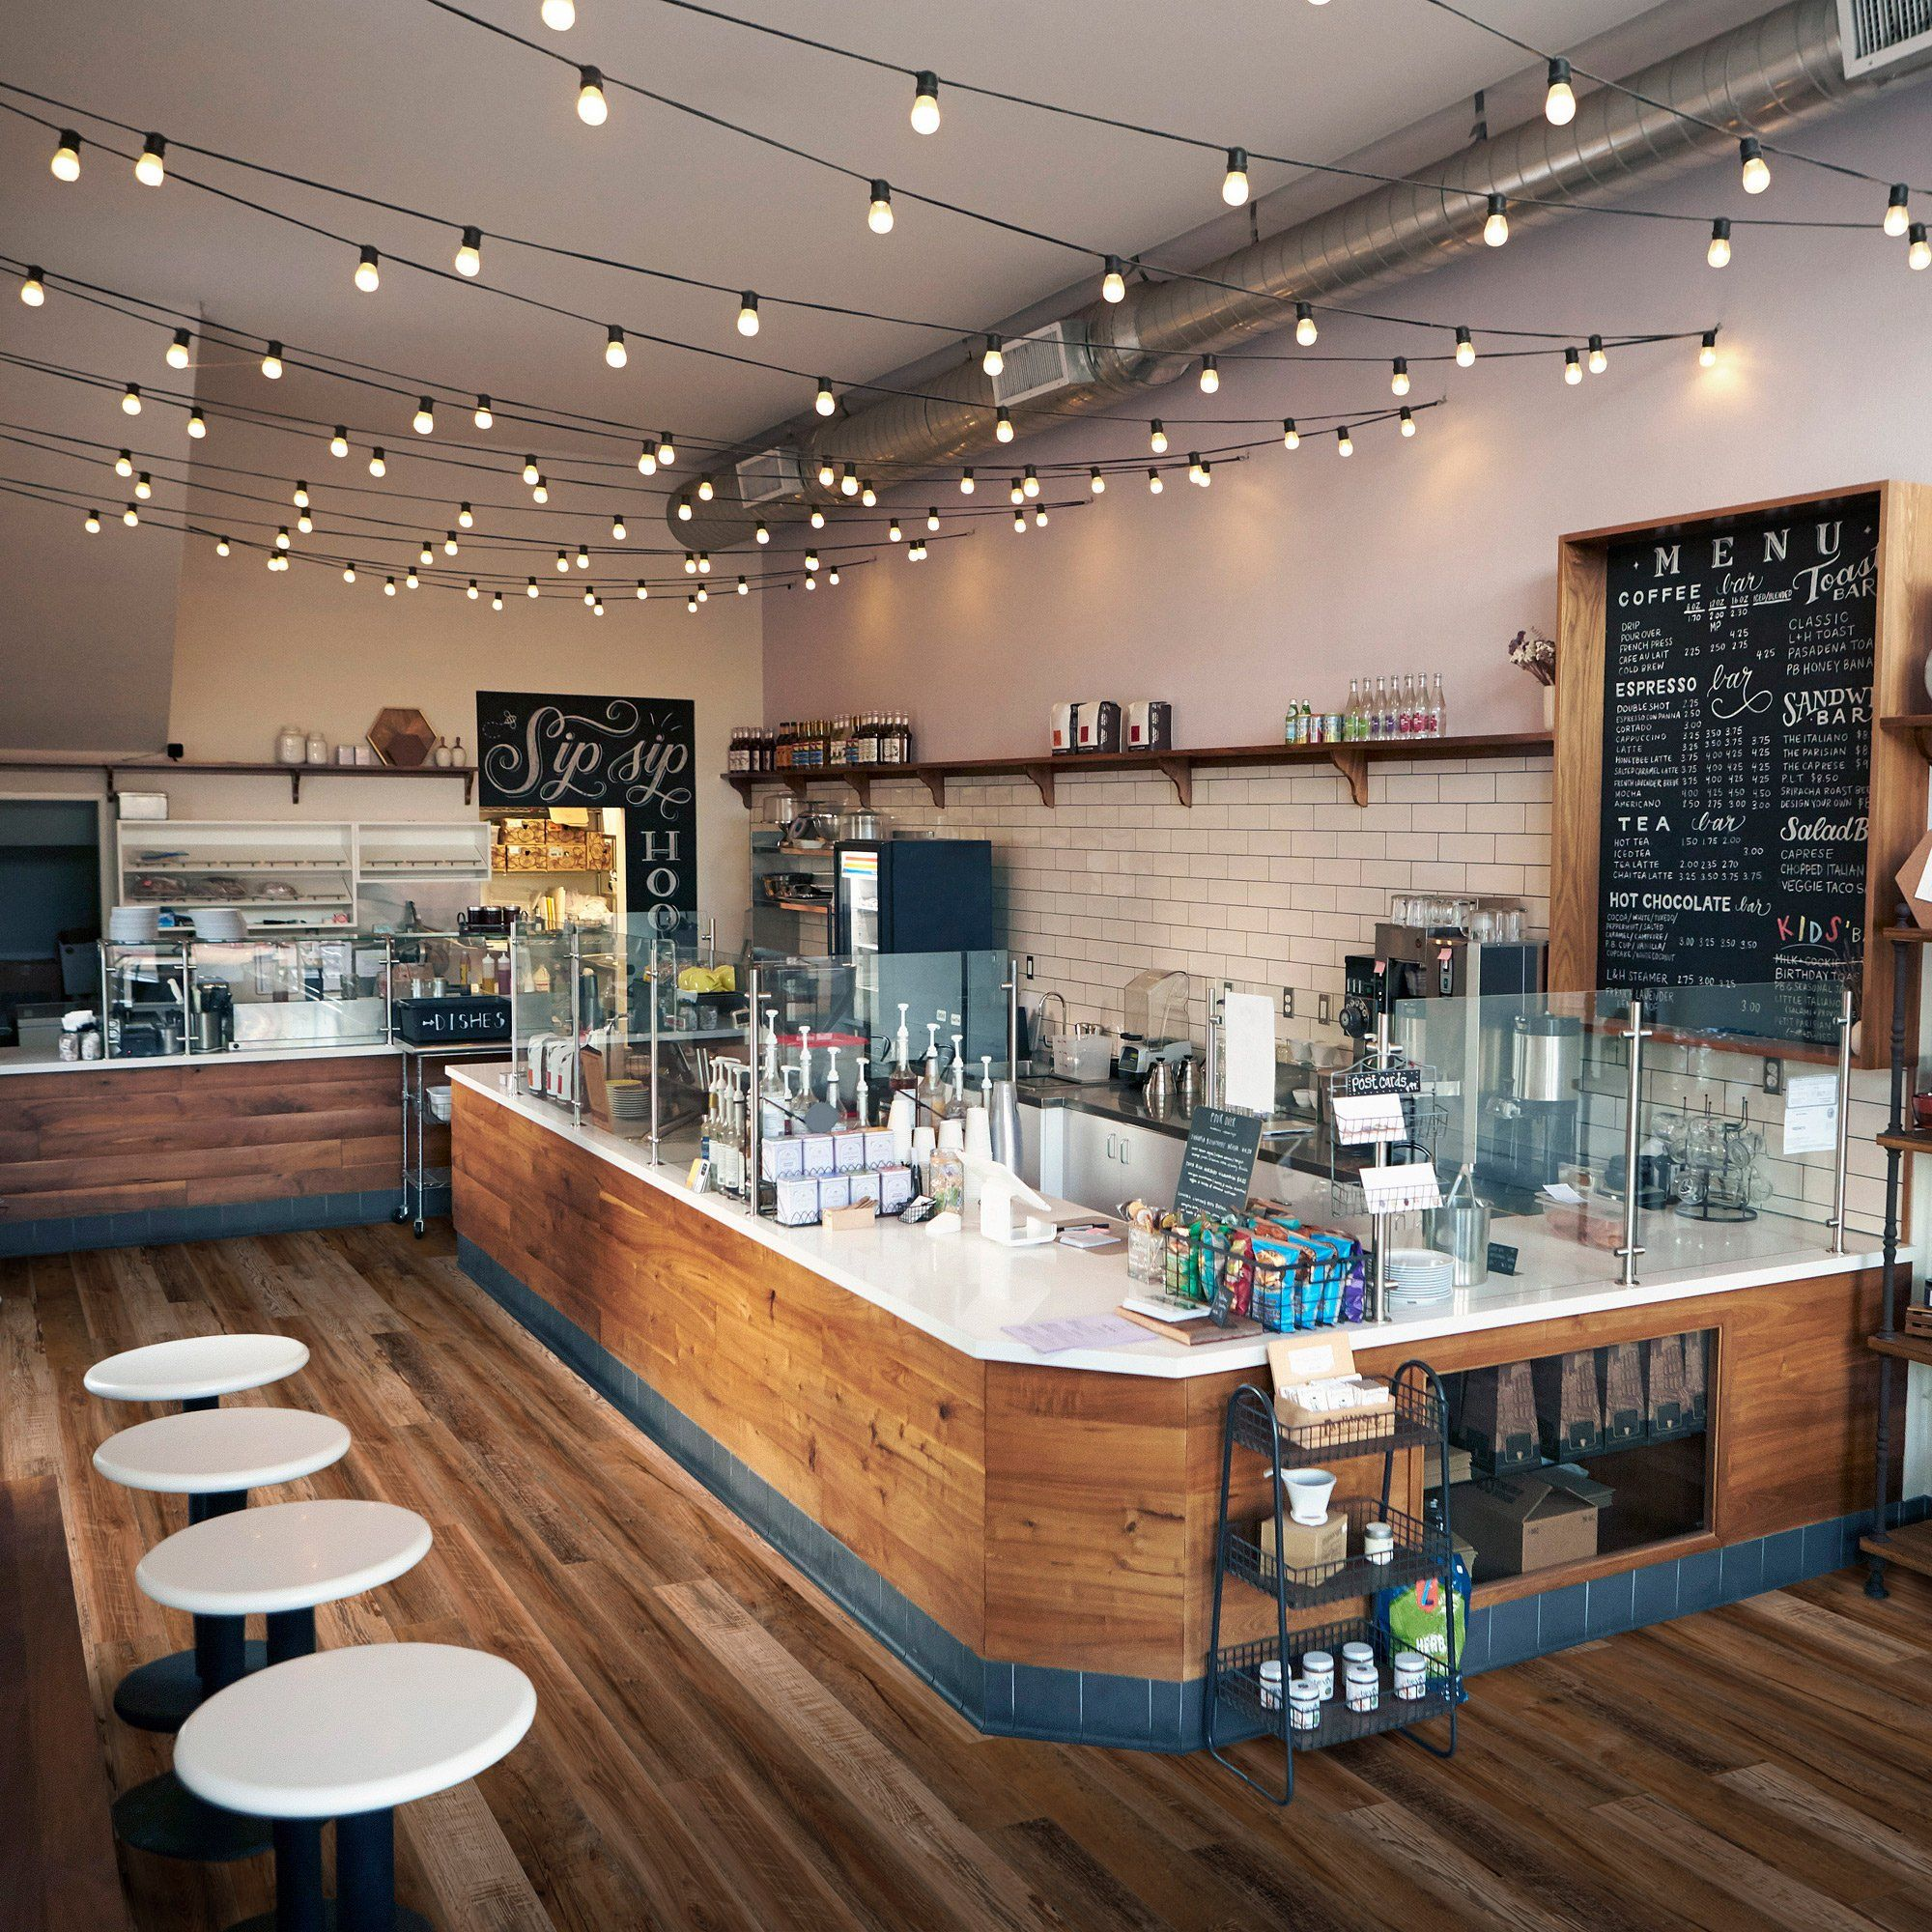 Cali Vinyl Pro Pet Proof Flooring Mesquite 23 77 Sq Ft Box Petco Cafe Interior Design Cafe Interior Coffee Shop Decor